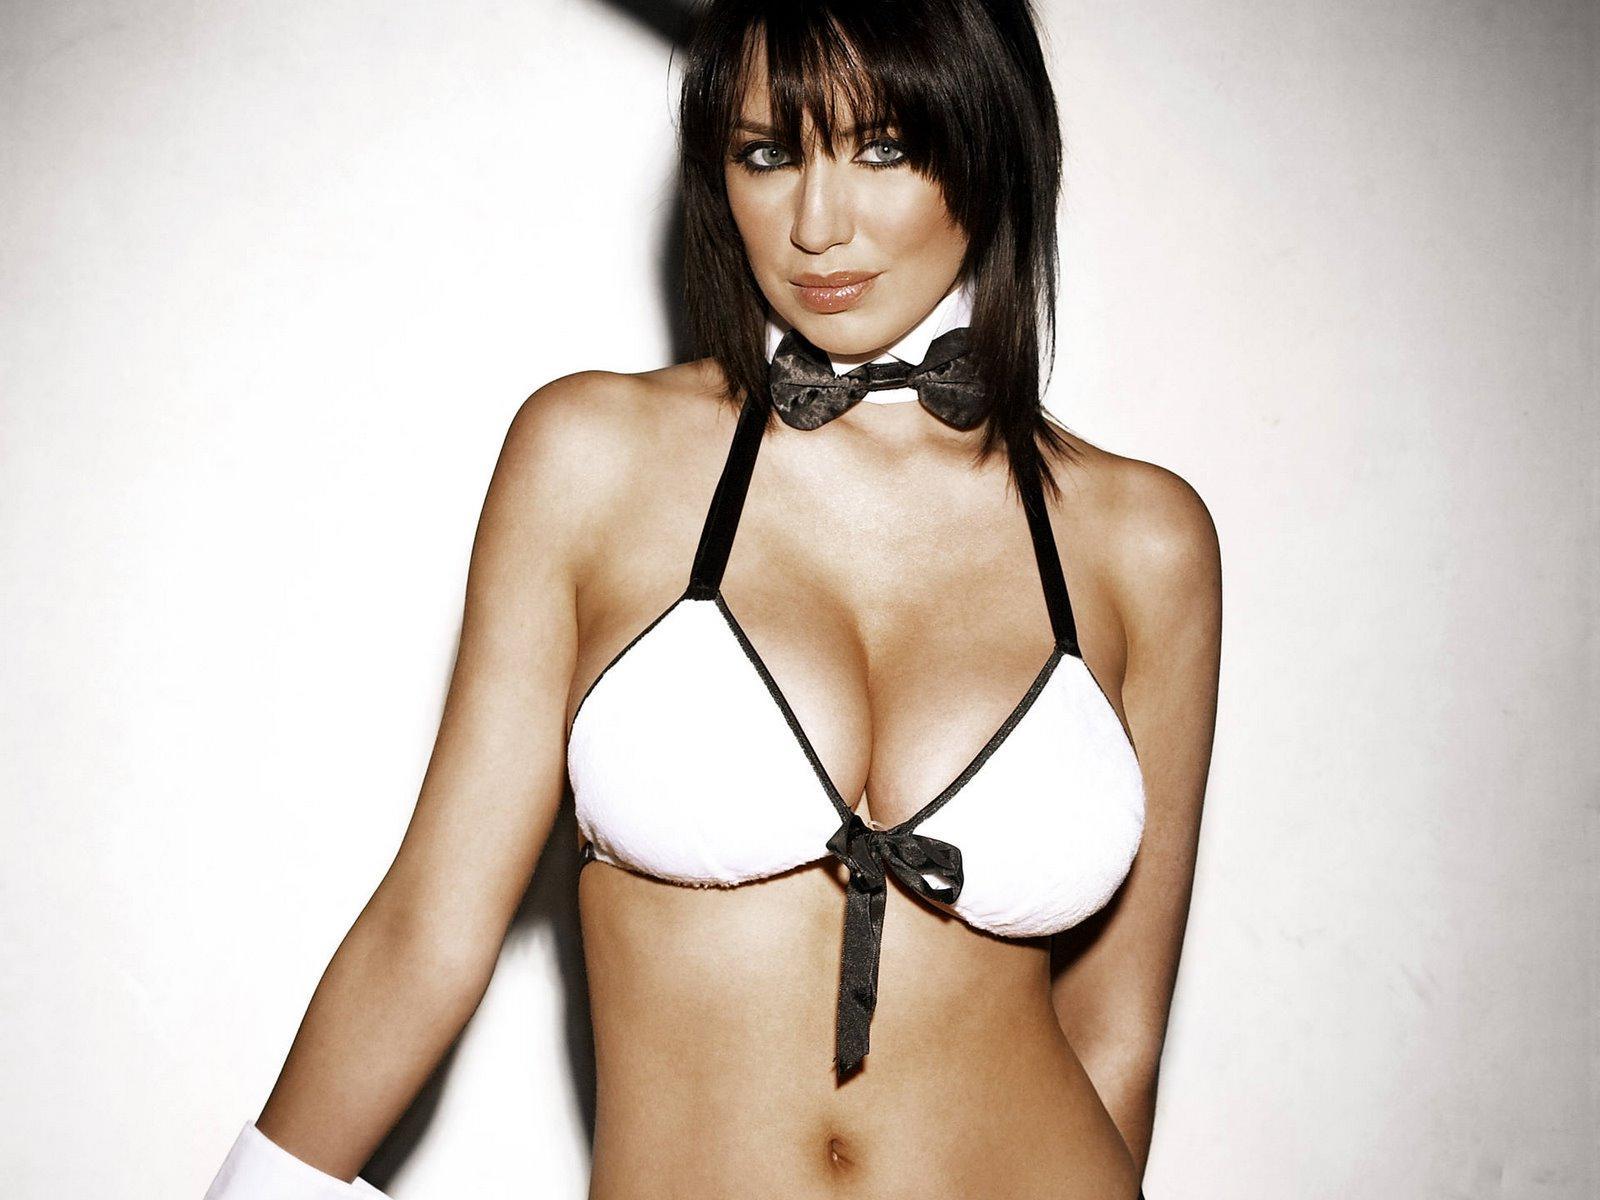 mexican girl big titties